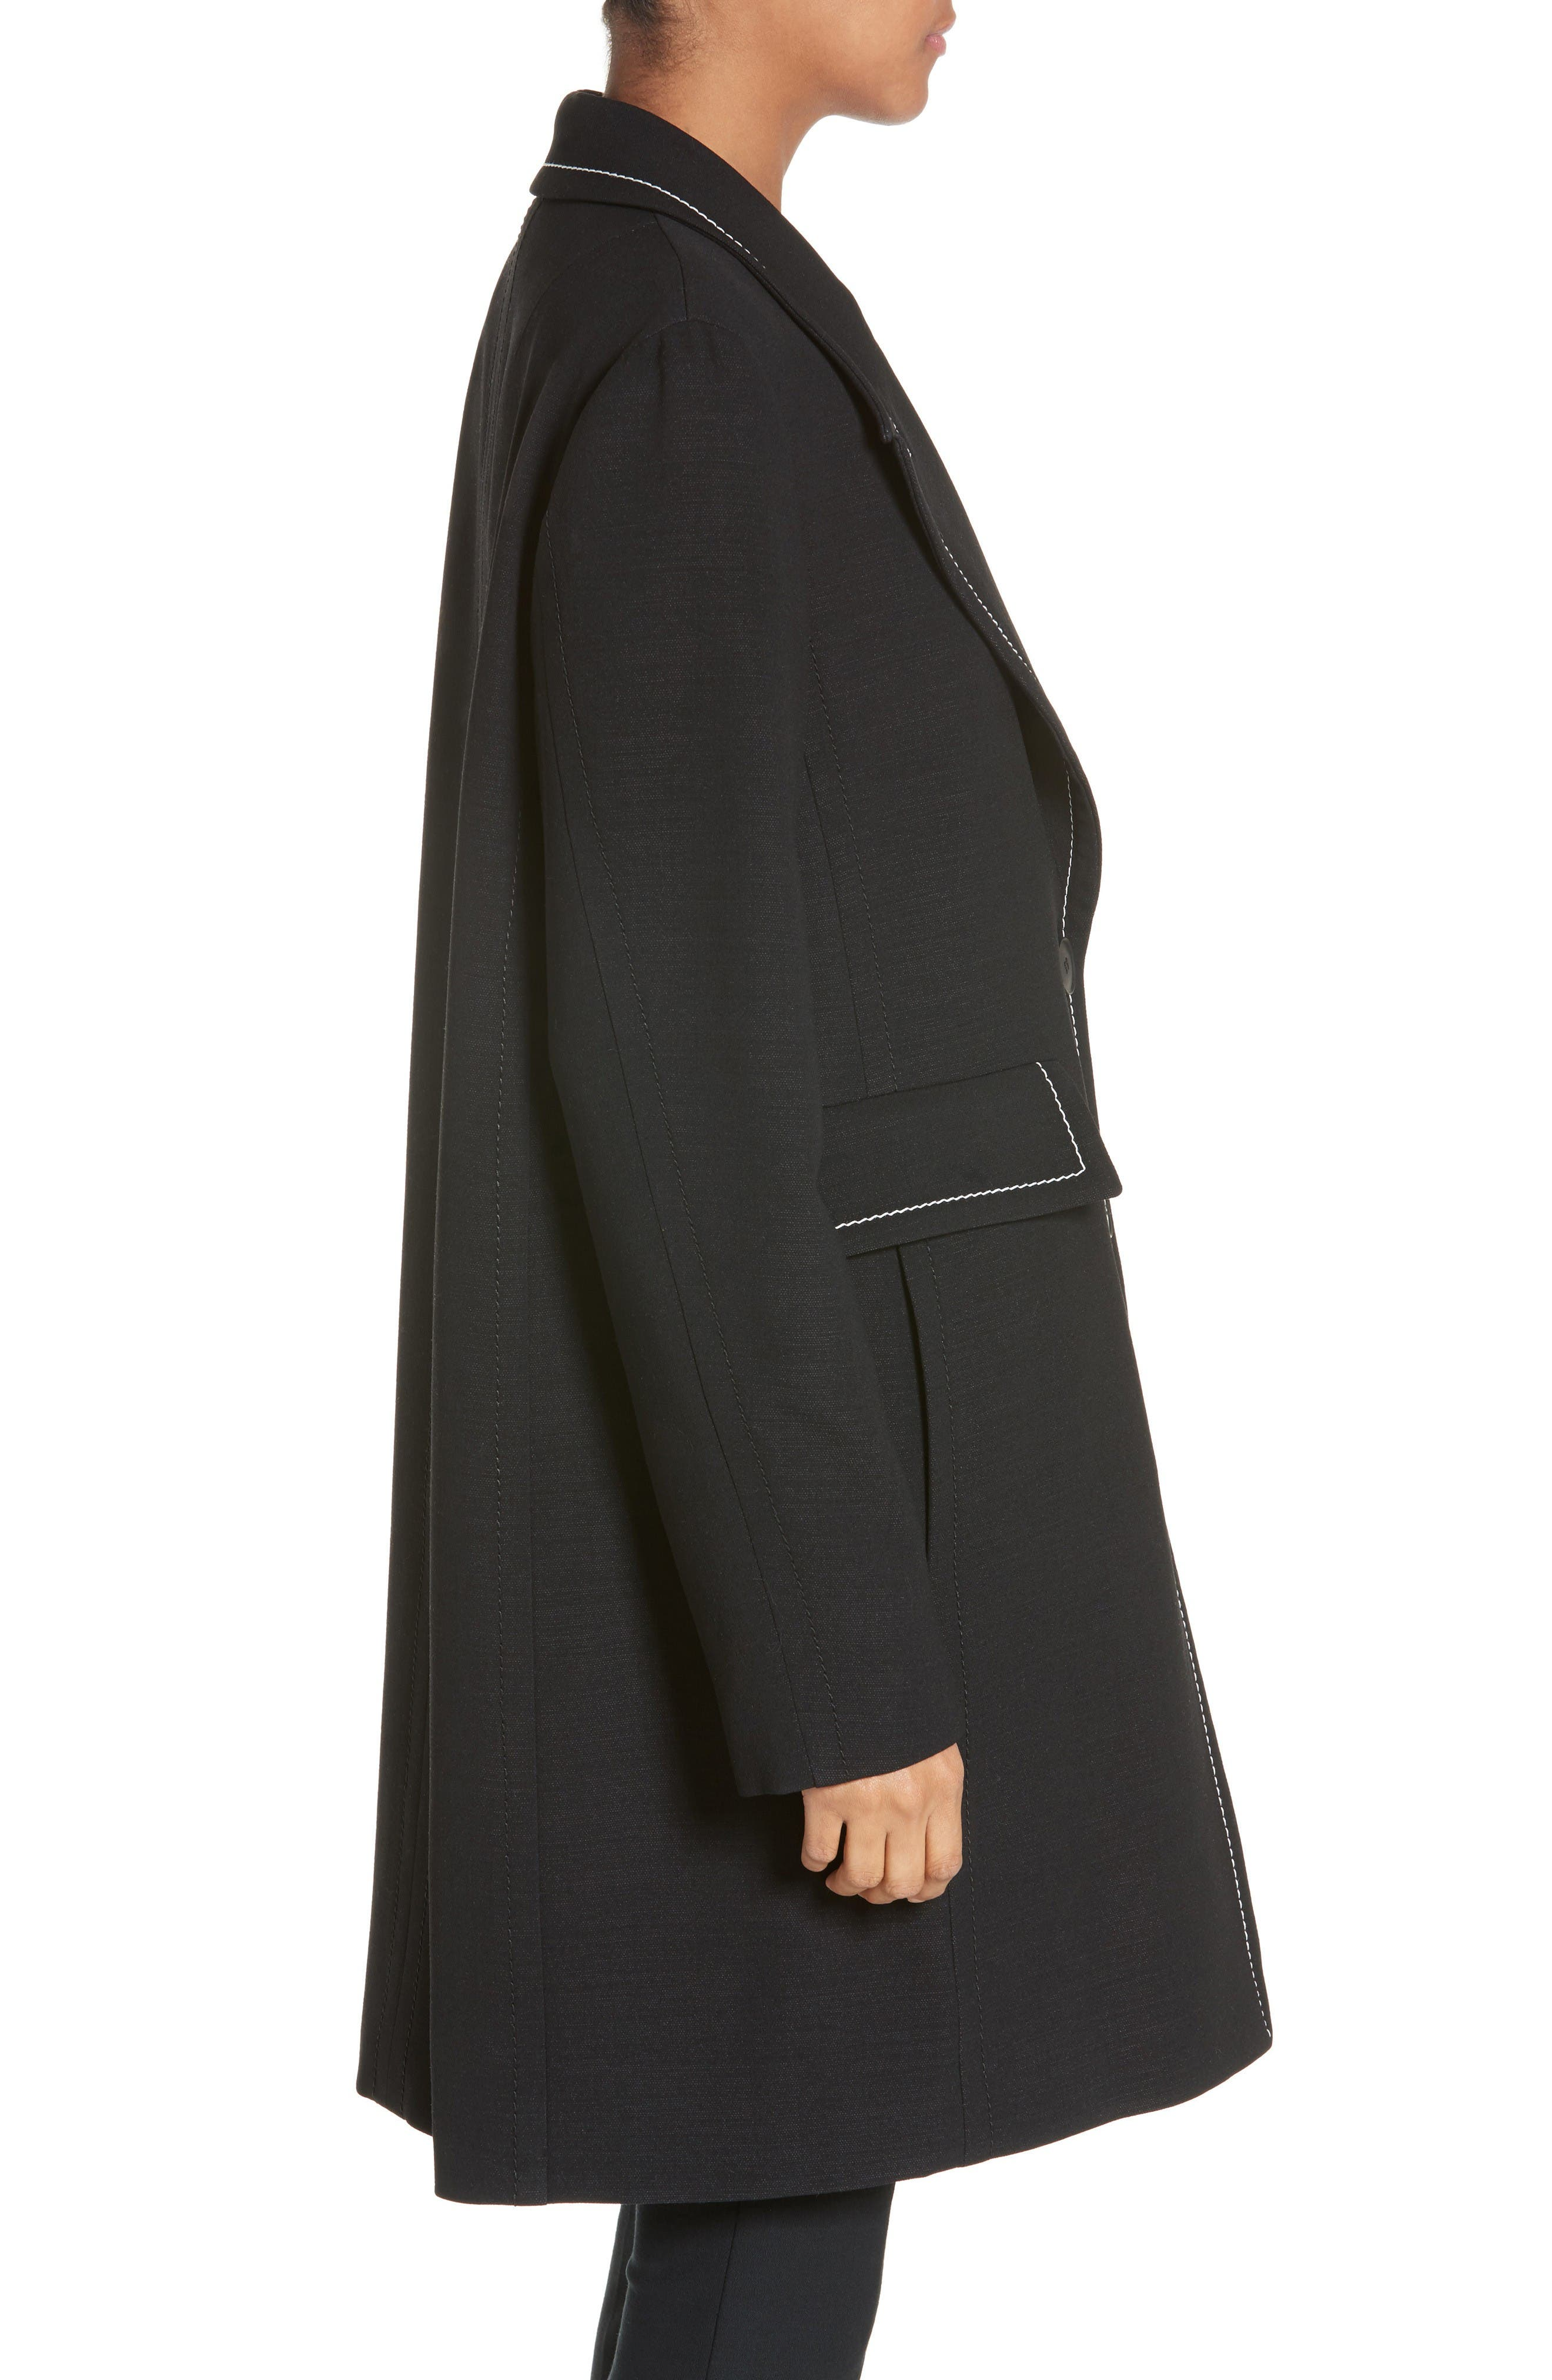 Marcelline Topstitch Double Face Wool Coat,                             Alternate thumbnail 5, color,                             Black/ Mistletoe